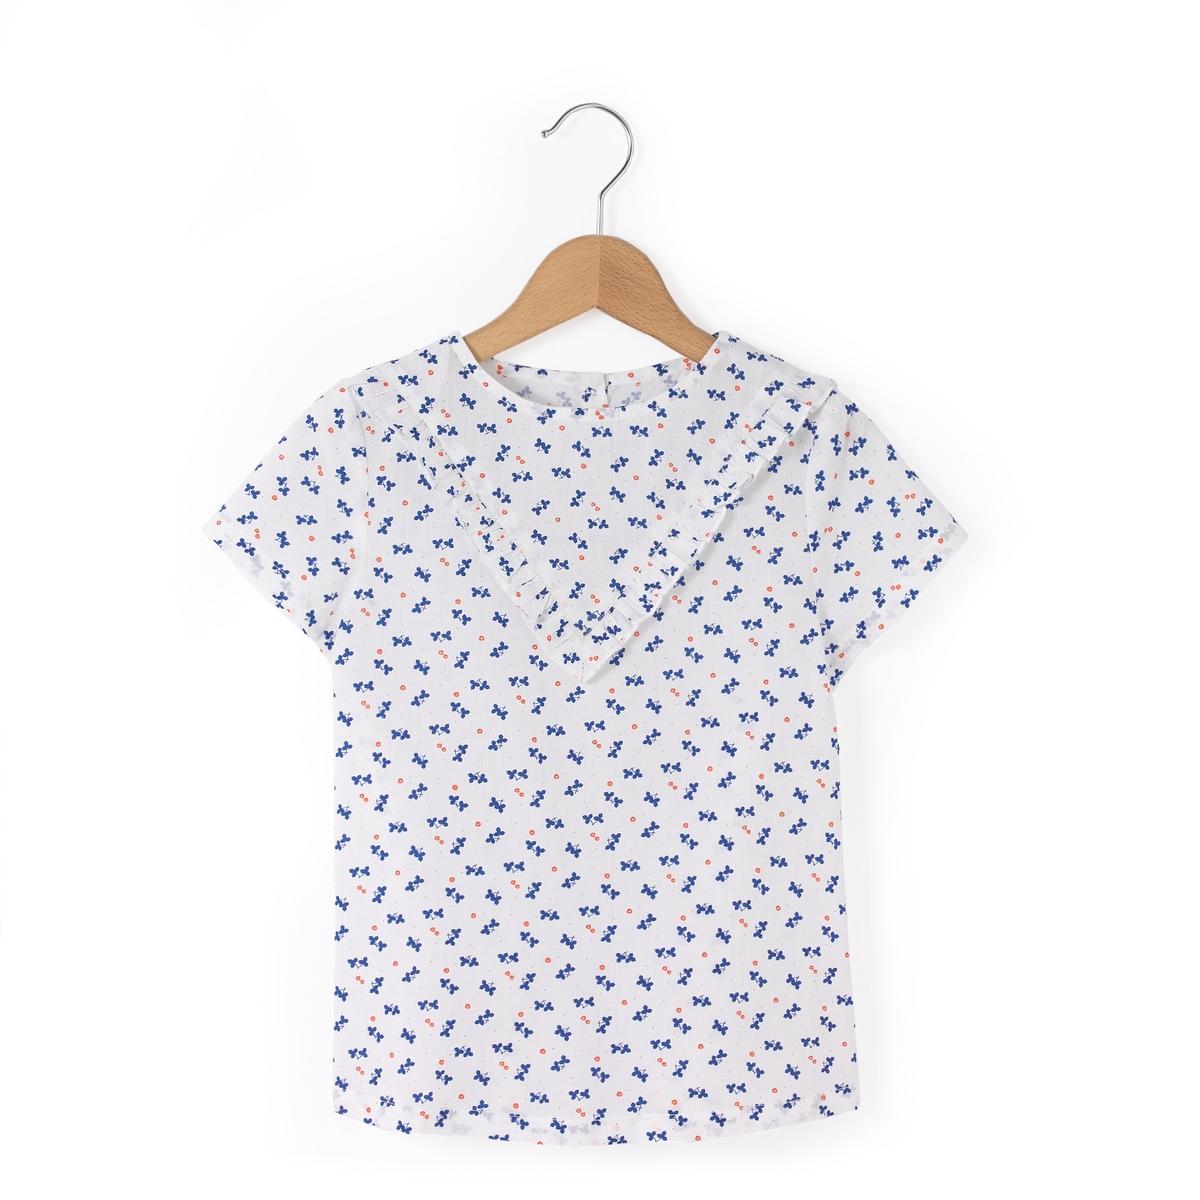 Блузка с короткими рукавами 3-12 лет